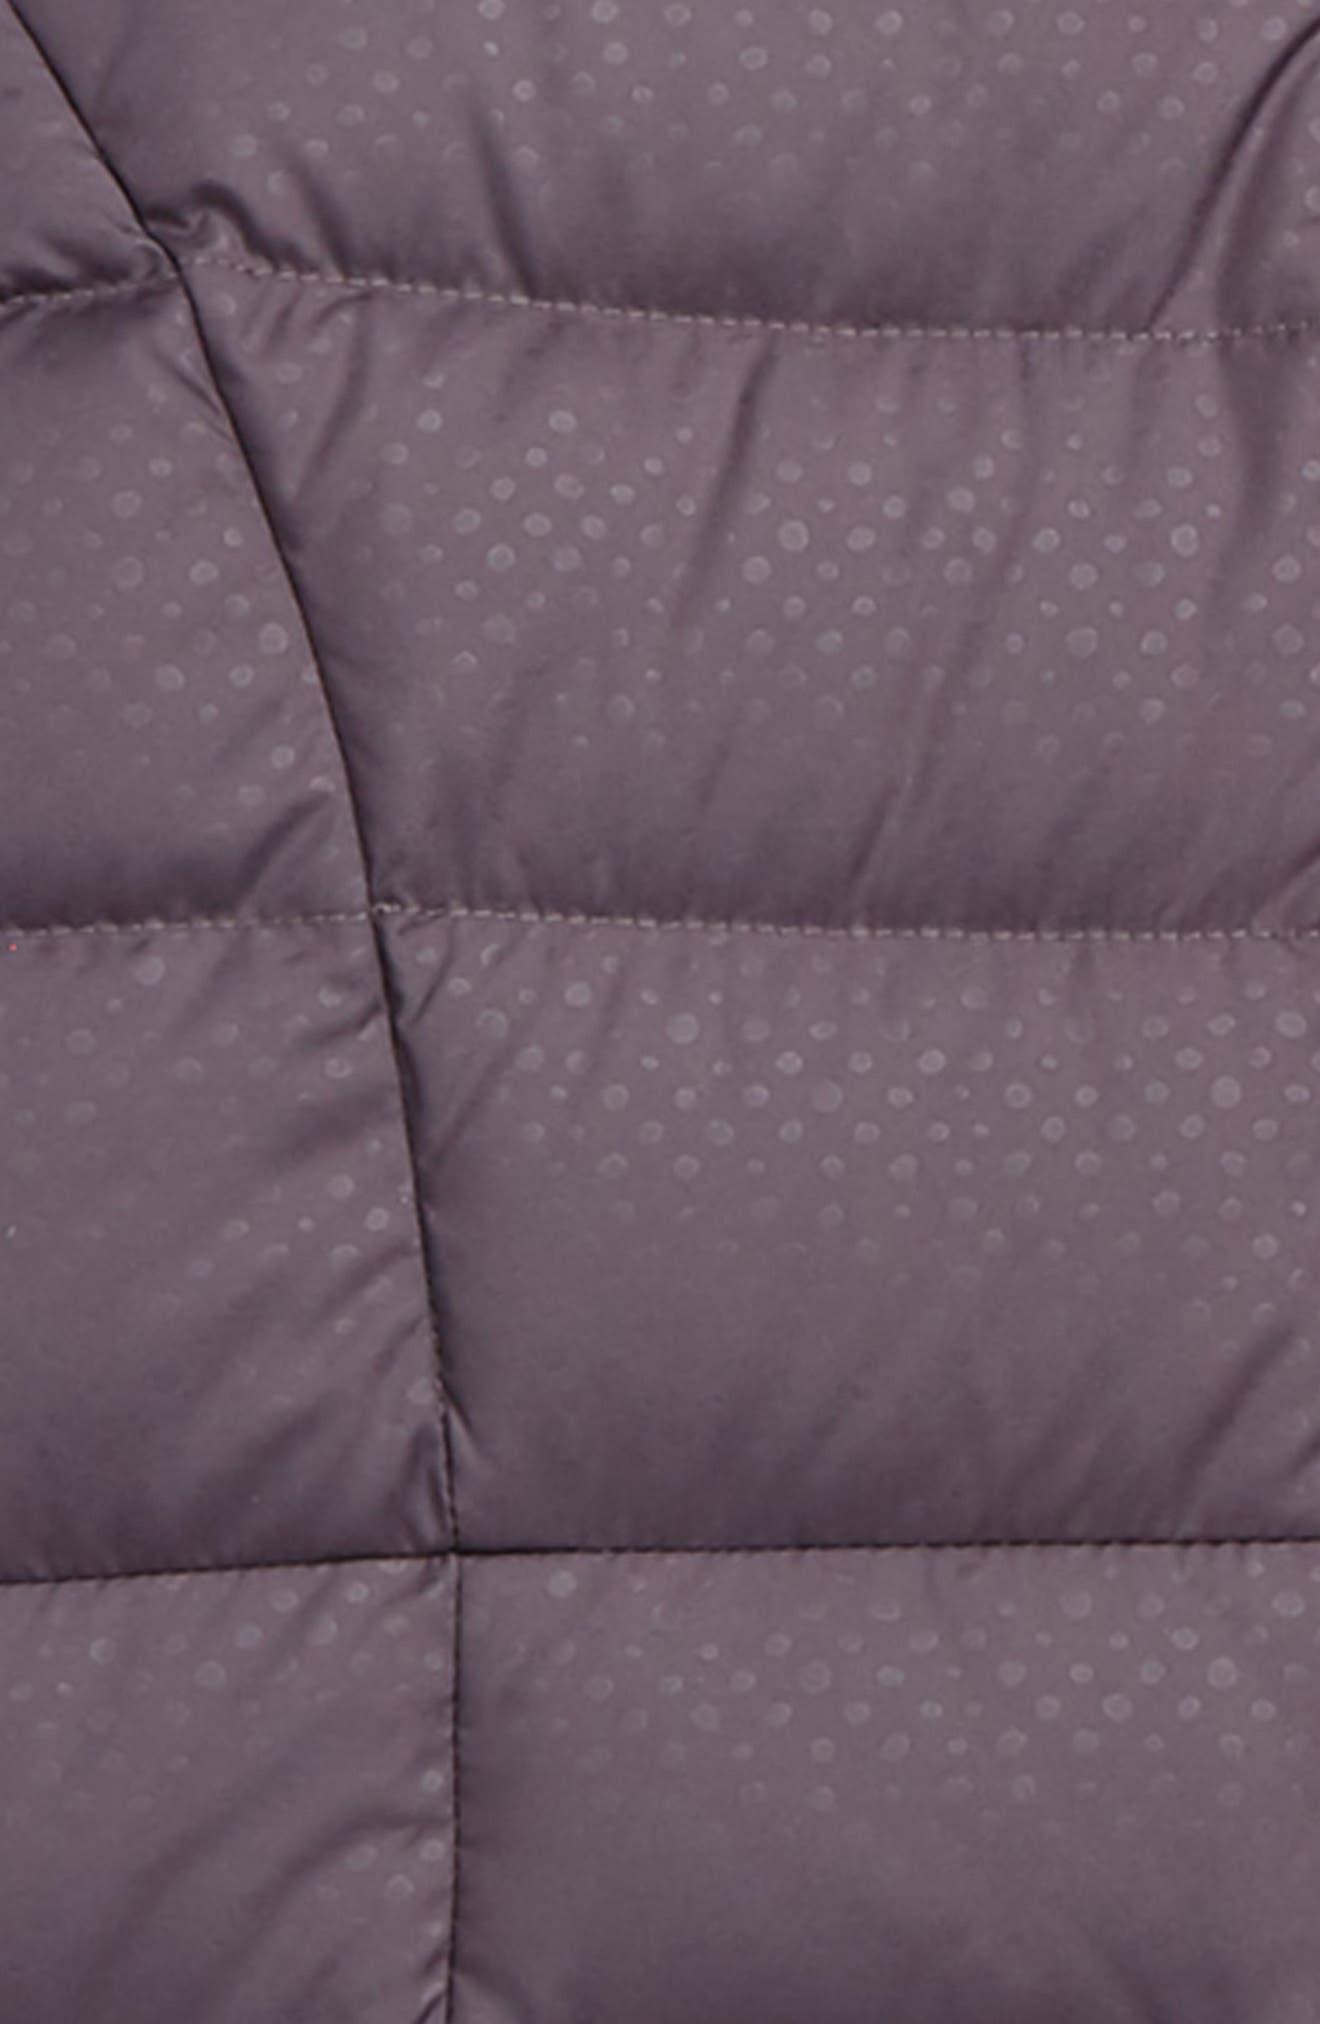 Gotham 2.0 550-Fill Down Jacket,                             Alternate thumbnail 2, color,                             Rabbit Grey